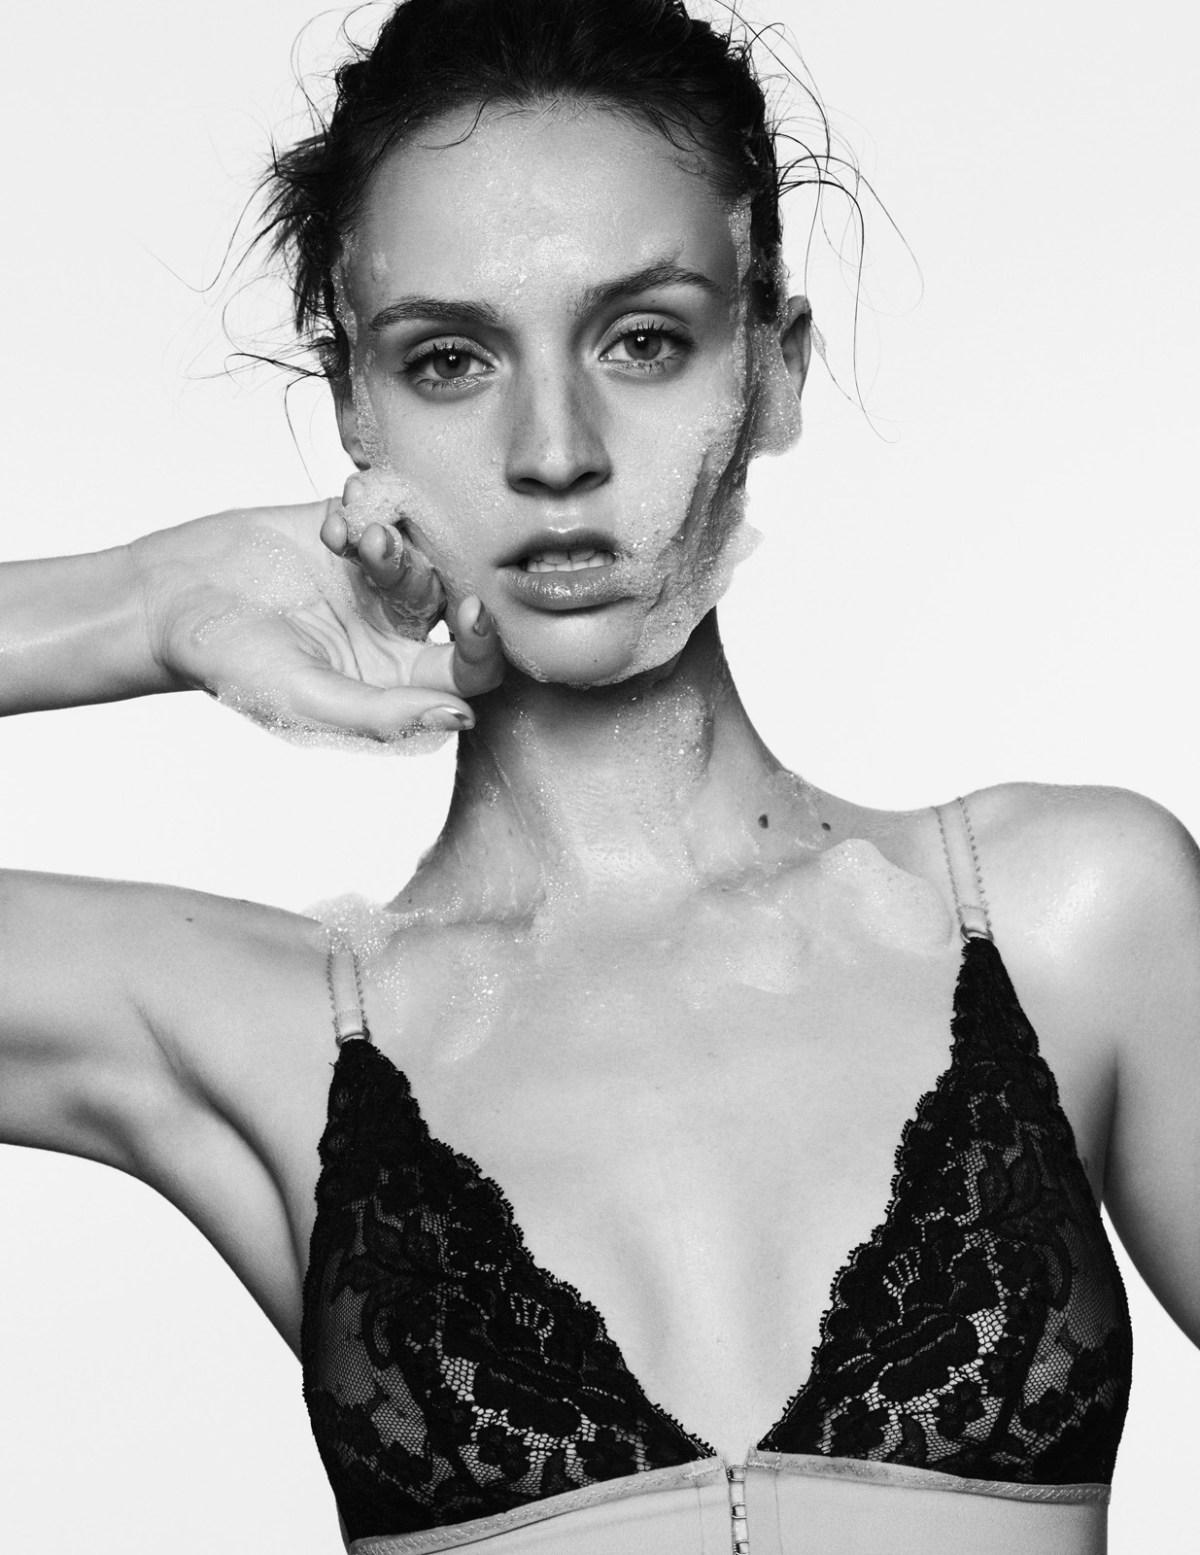 Maddie Kulicka by Pelle Lennefors for Elle France